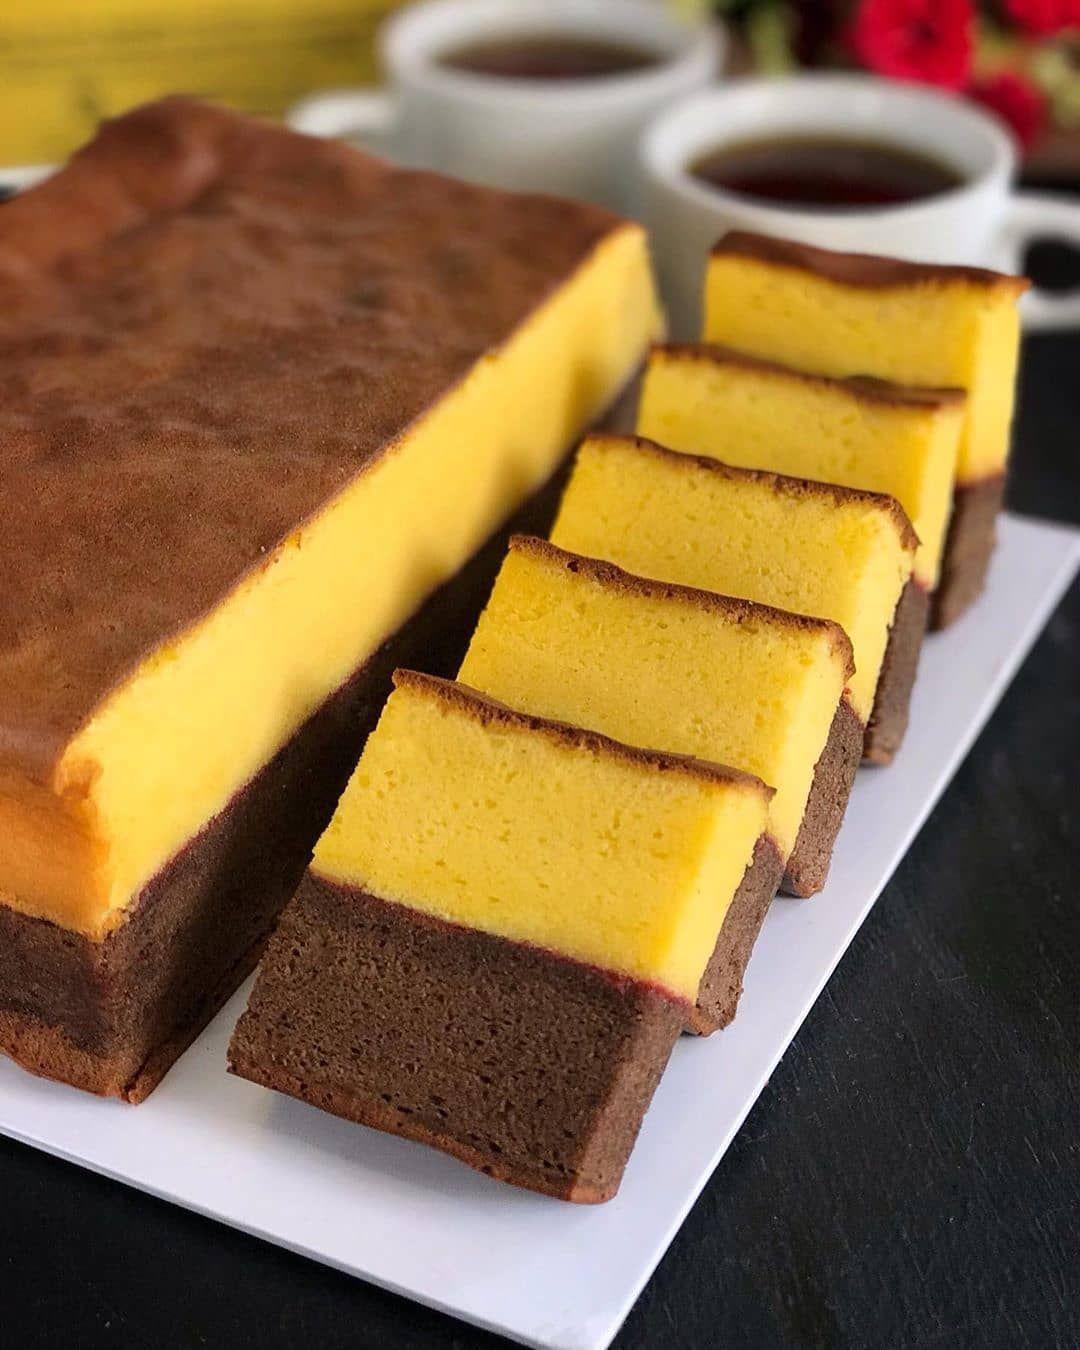 Jangan Lupa Tap Love Yah Lapis Surabaya Bake By Linagui Kitchen Bahan Utk Lapisan Kuning Bahan A Aneka Kue Kue Makanan